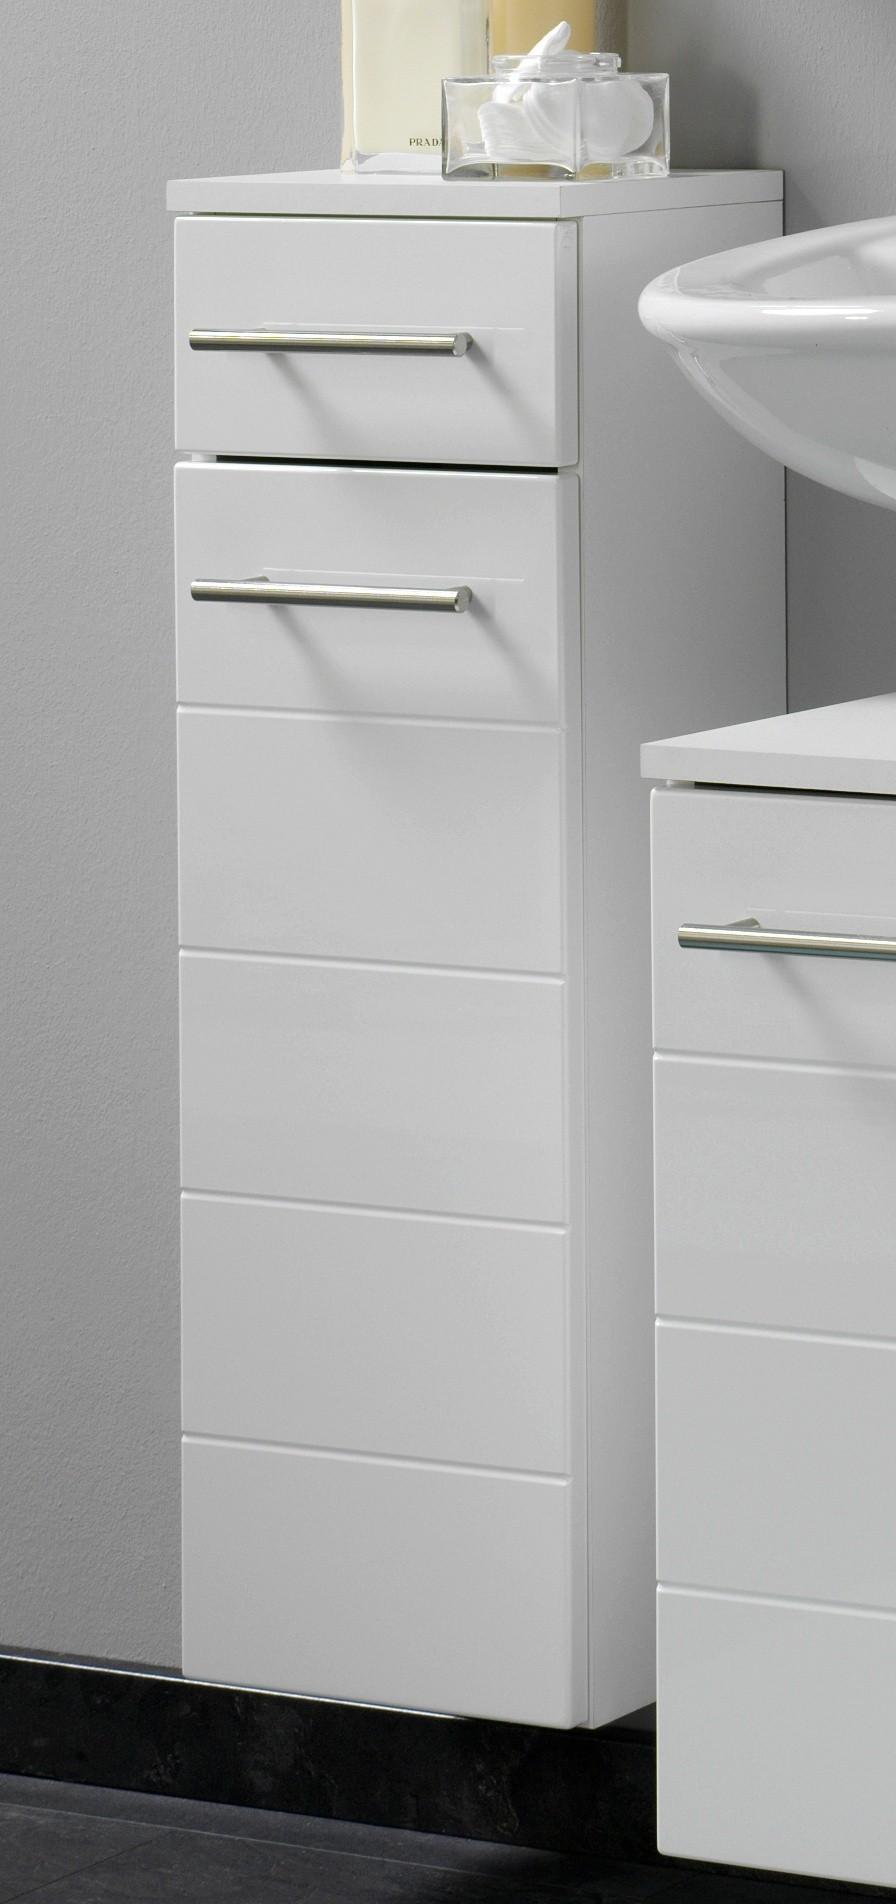 neu badezimmer unterschrank rimini badschrank badezimmerschrank weiss ebay. Black Bedroom Furniture Sets. Home Design Ideas